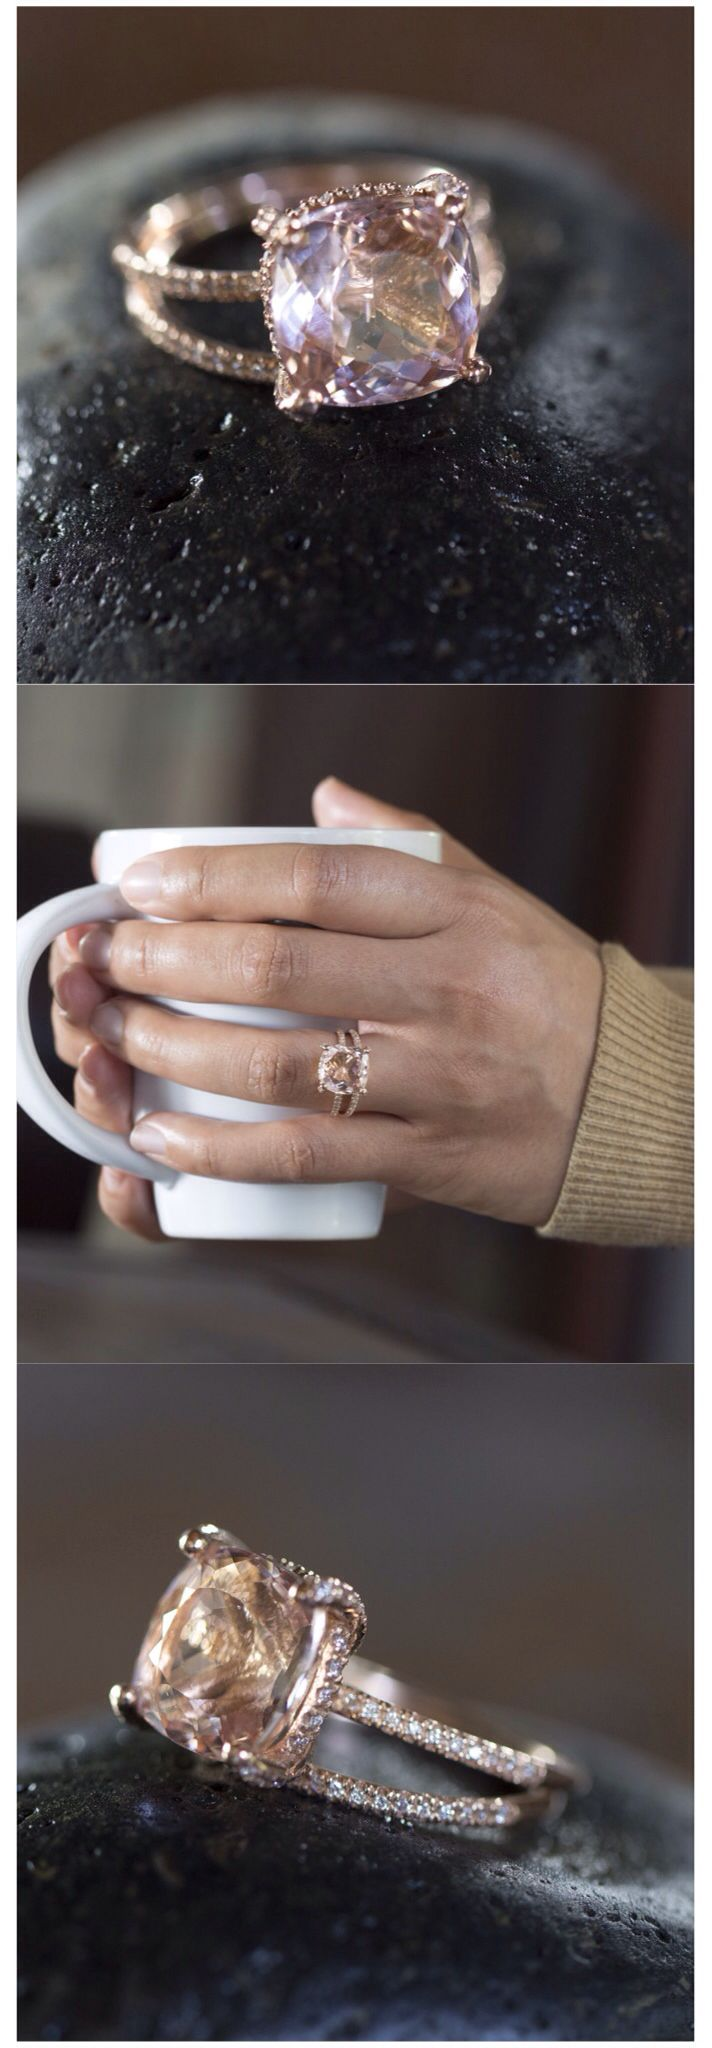 morganite ring morganite wedding ring set Cushion Cut Morganite Engagement Ring with Diamond Side Halo Shank from Laurie Sarah Designs